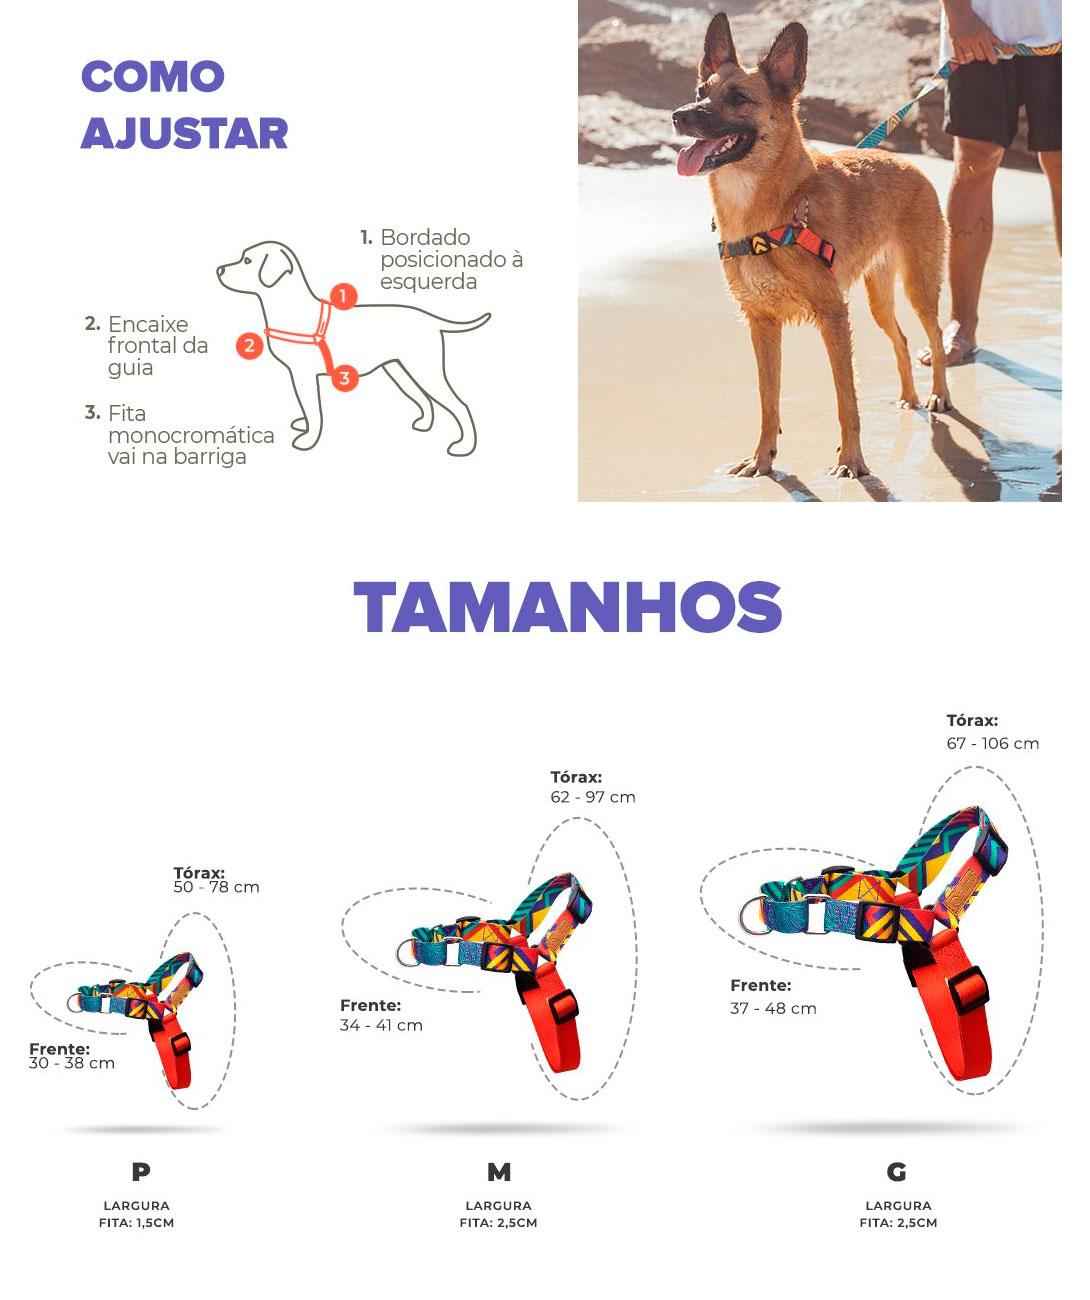 Tamanhos Coleira Peitoral Cachorreiros T-Mutts - Petite Sofie